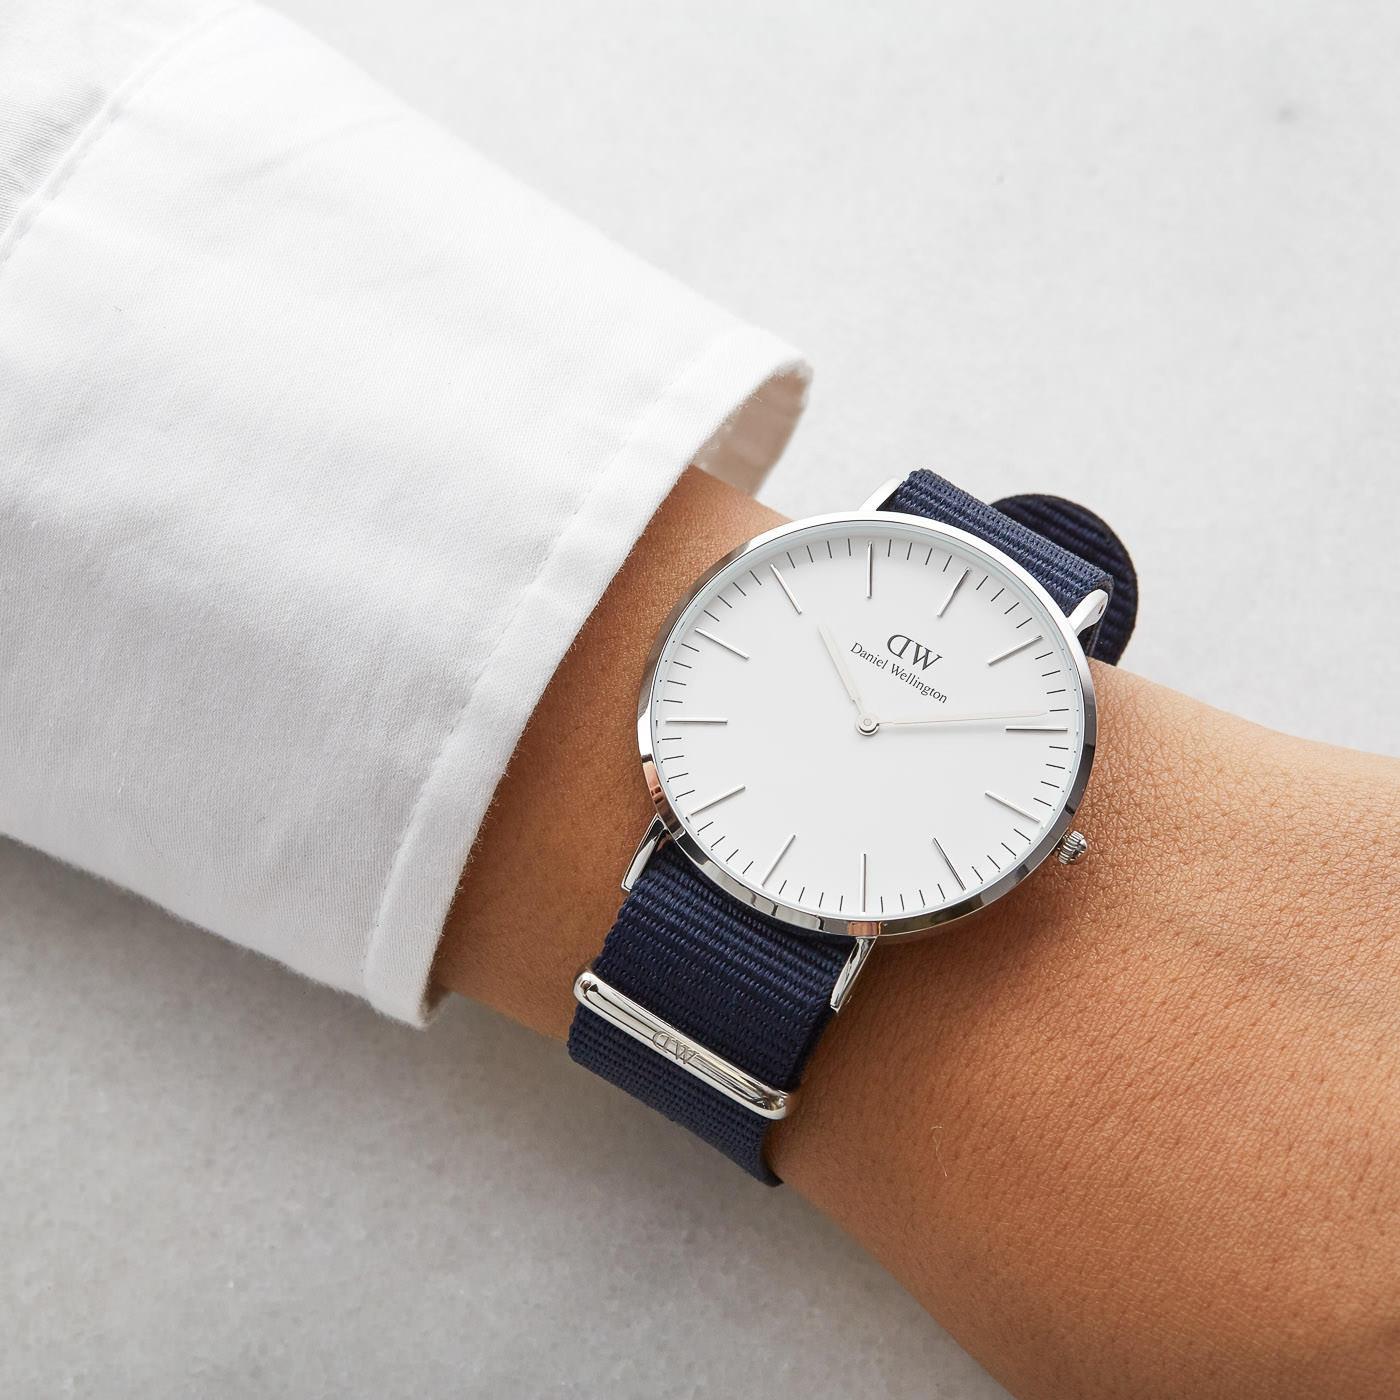 b525968f98e6 Daniel Wellington Classic watch DW00100276 - Watches